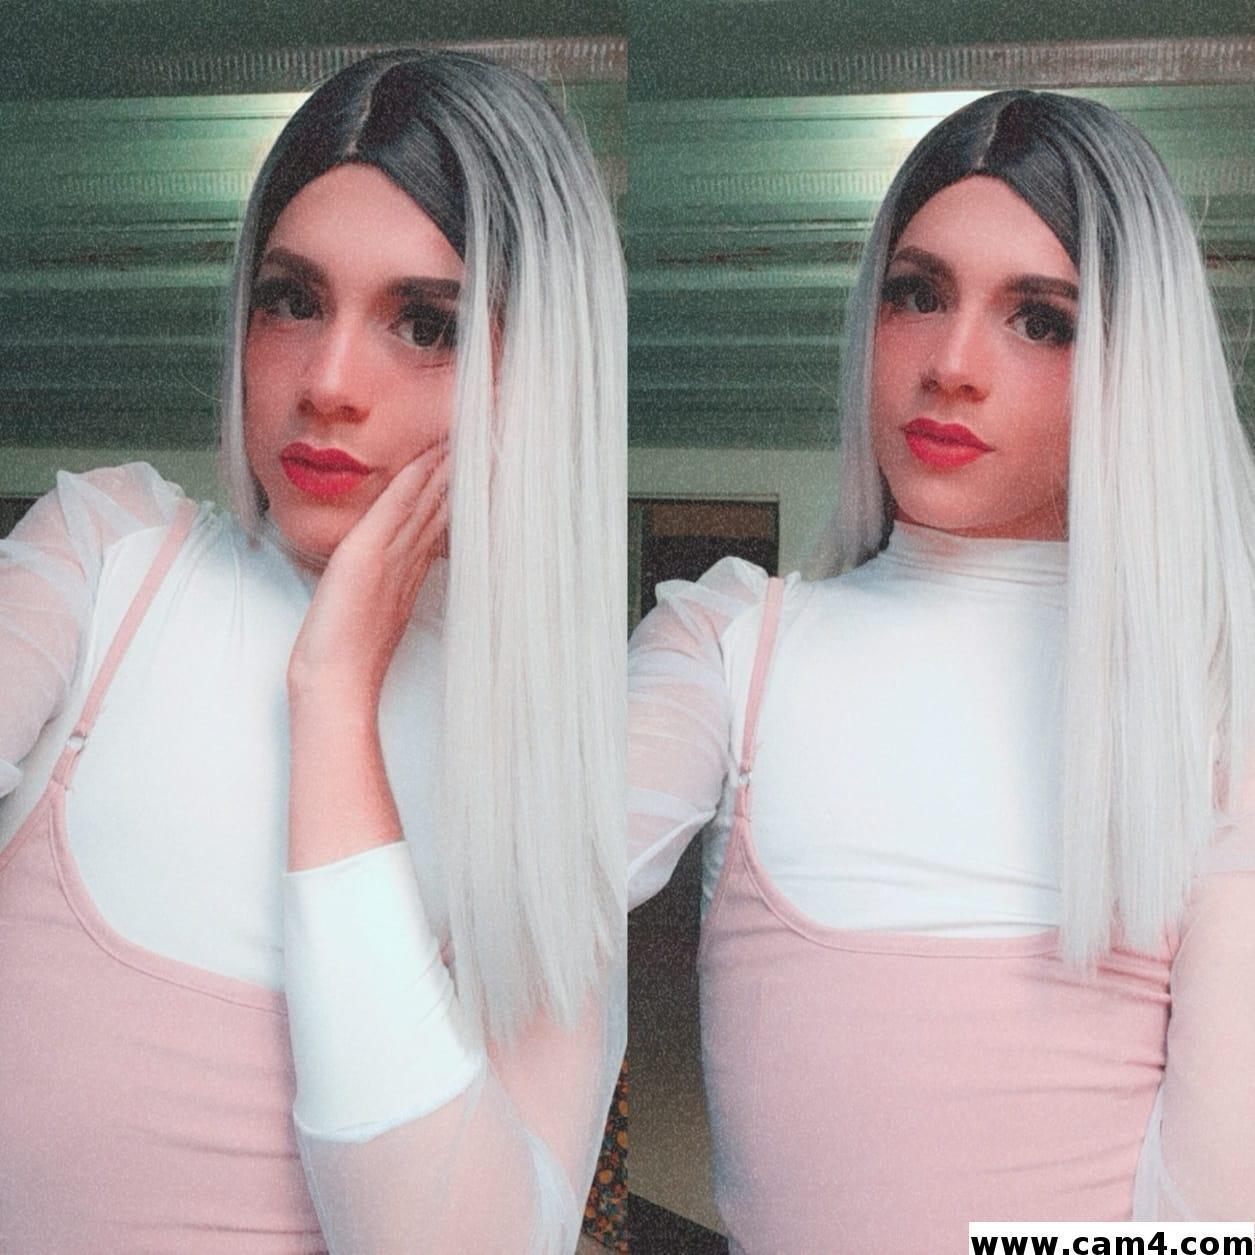 Arianna queen?s=253gr1w9vmd5pkqeutfrjcm8azoc7fqa9ud4maqlto4=